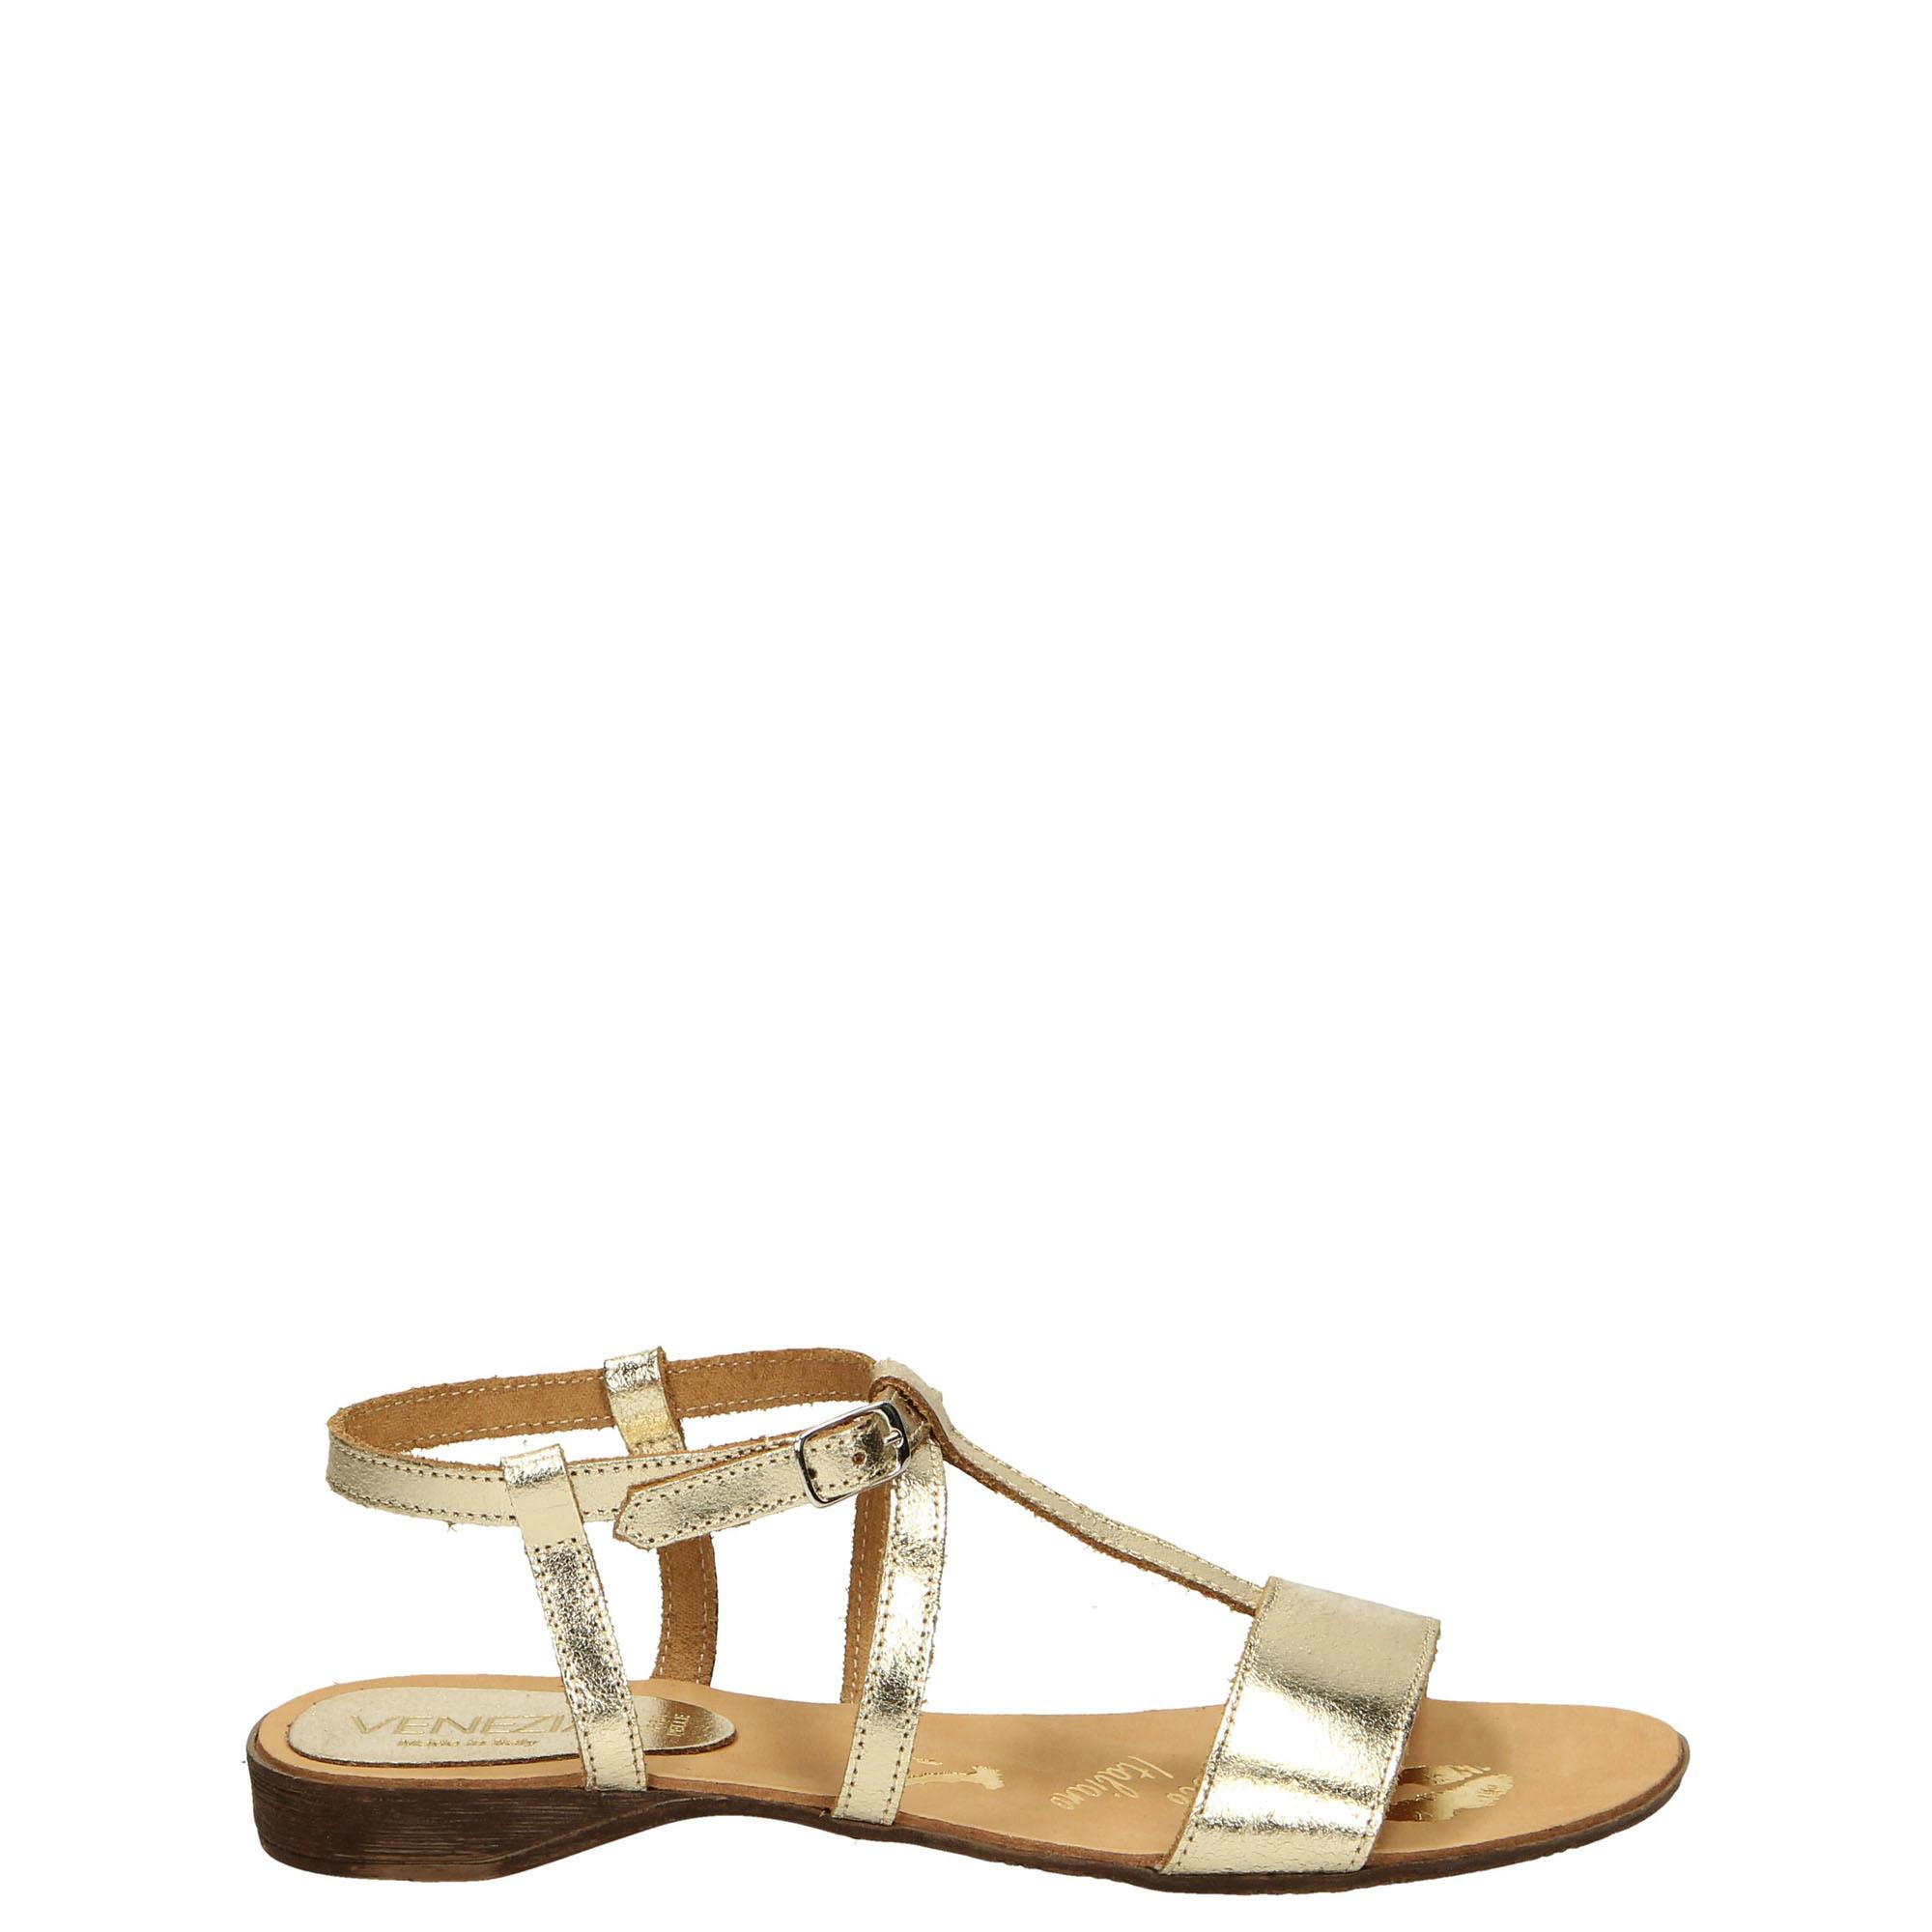 edc1d1bf679b9 sandały, kolekcja lato 2018 venezia sandały - 2695 lam plat - venezia